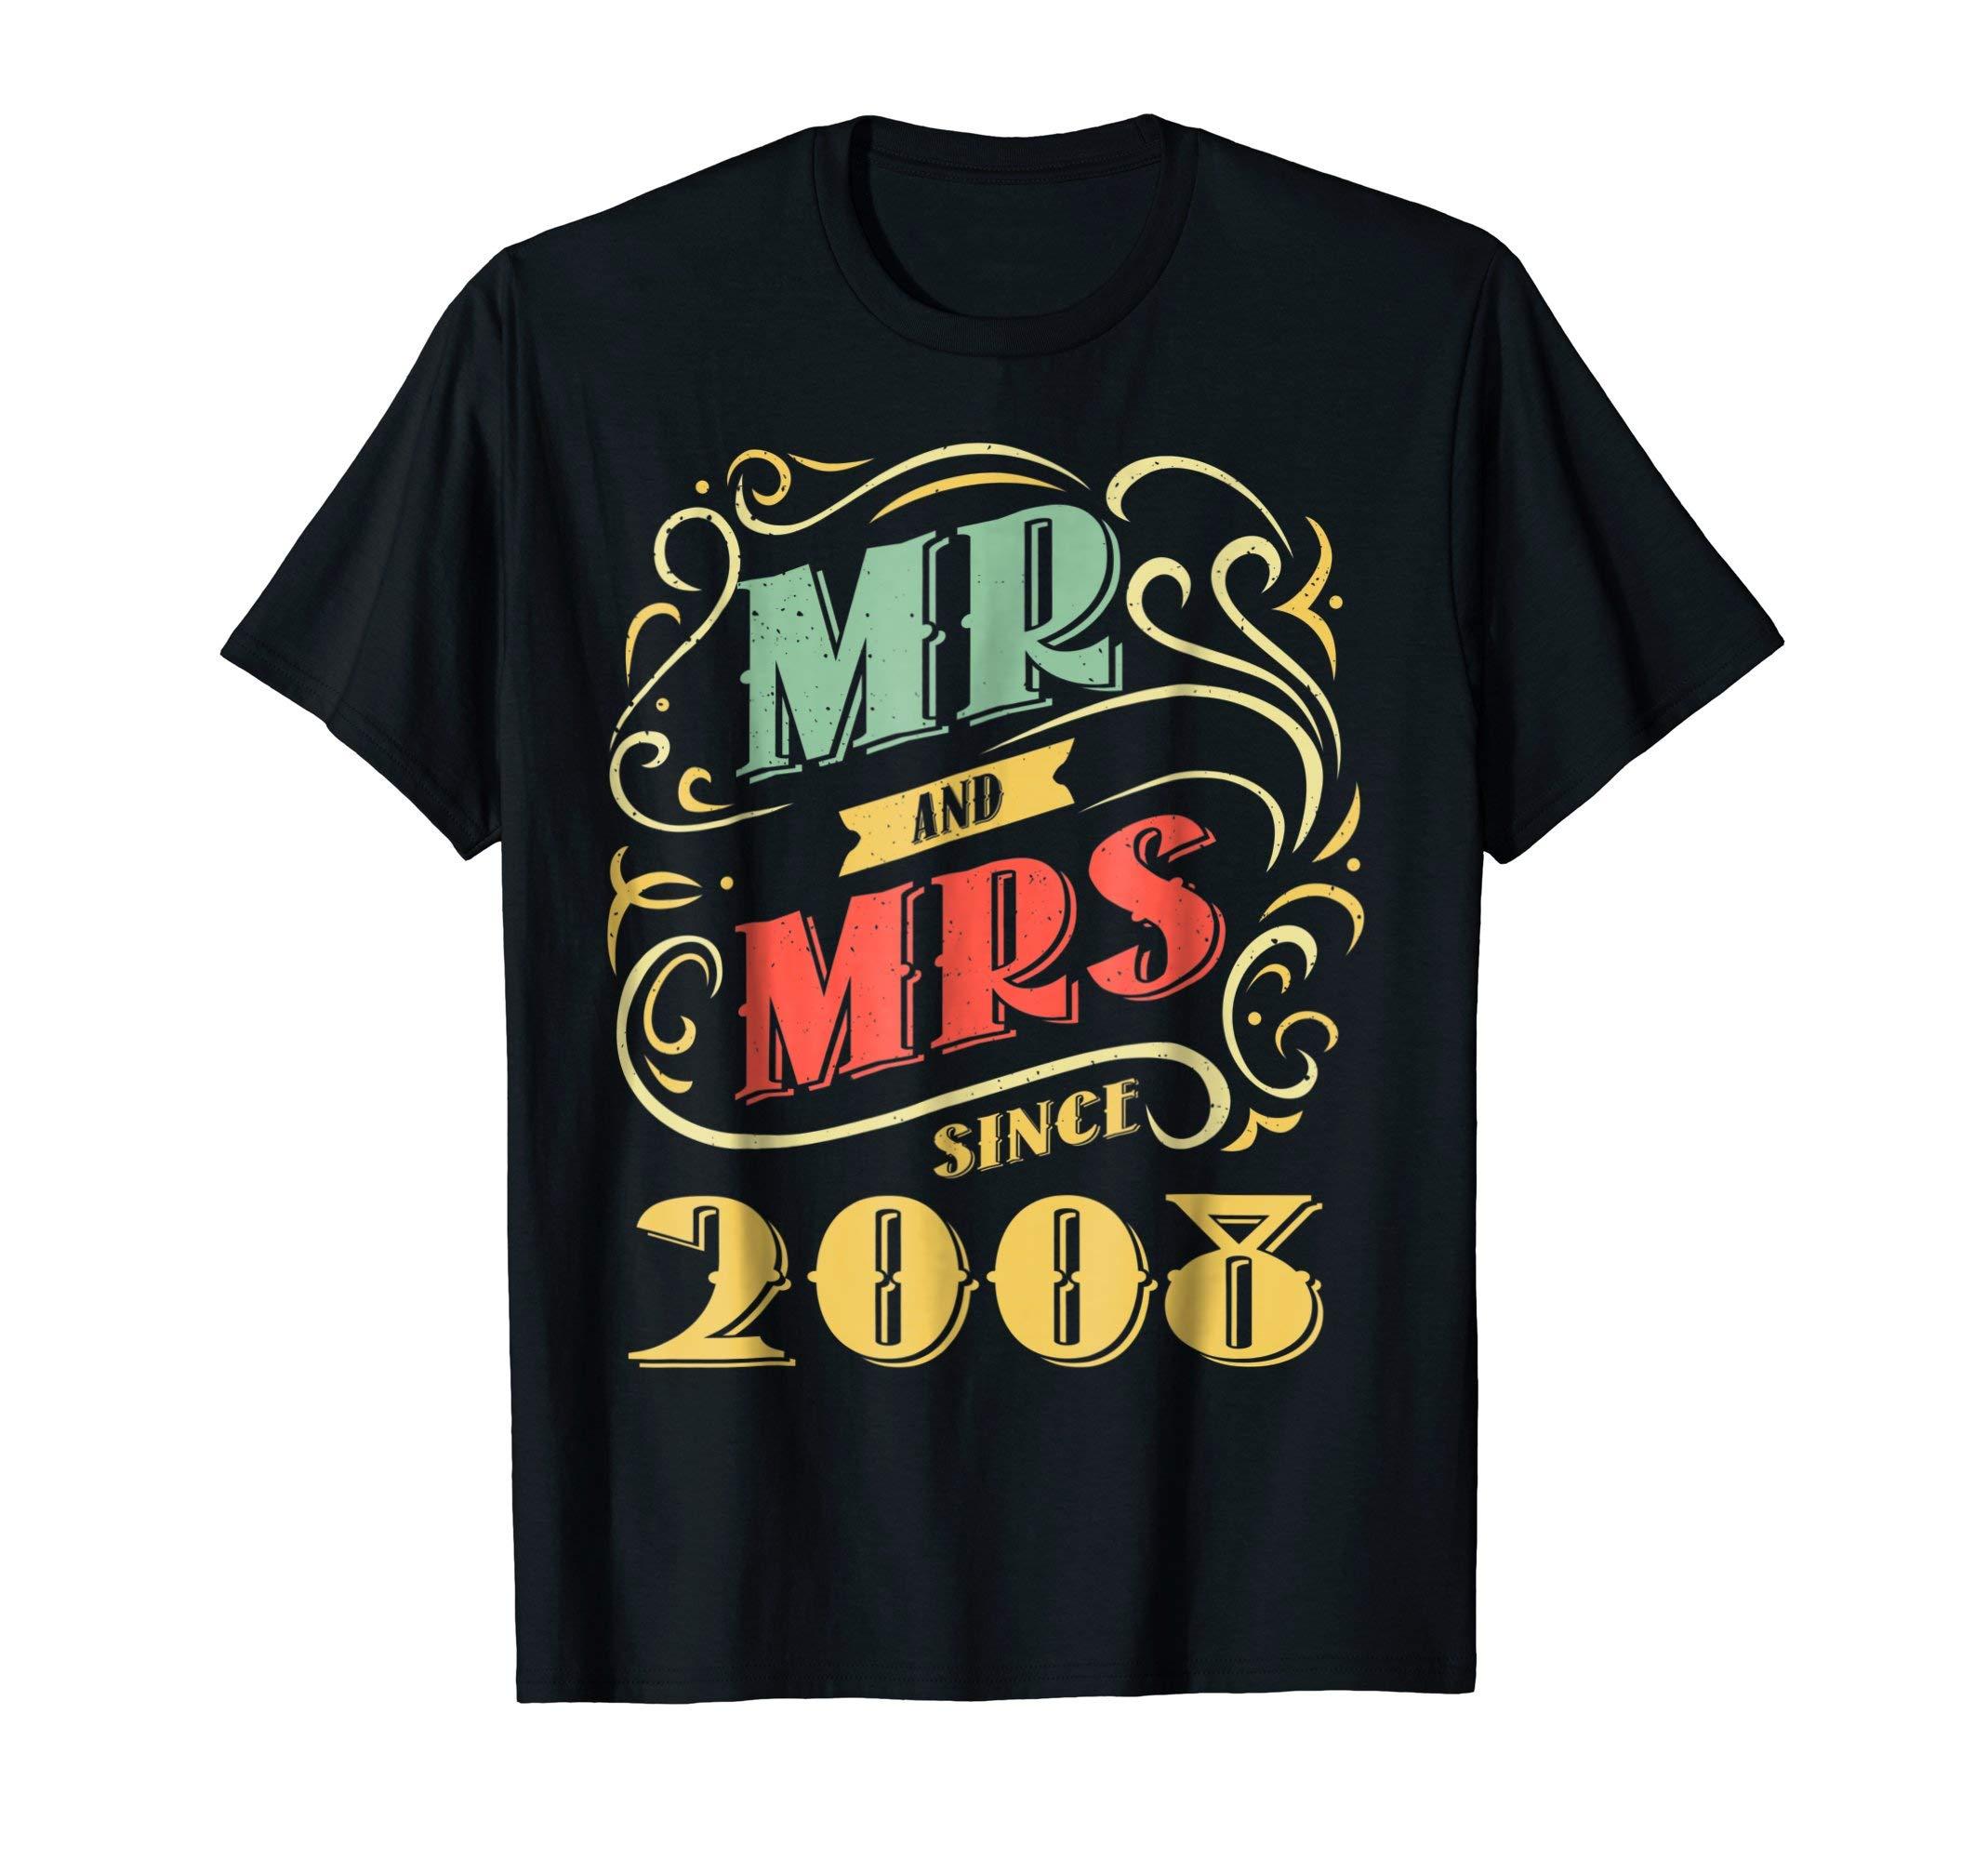 10th Wedding Anniversary TShirt For Husband Wife Since 2008